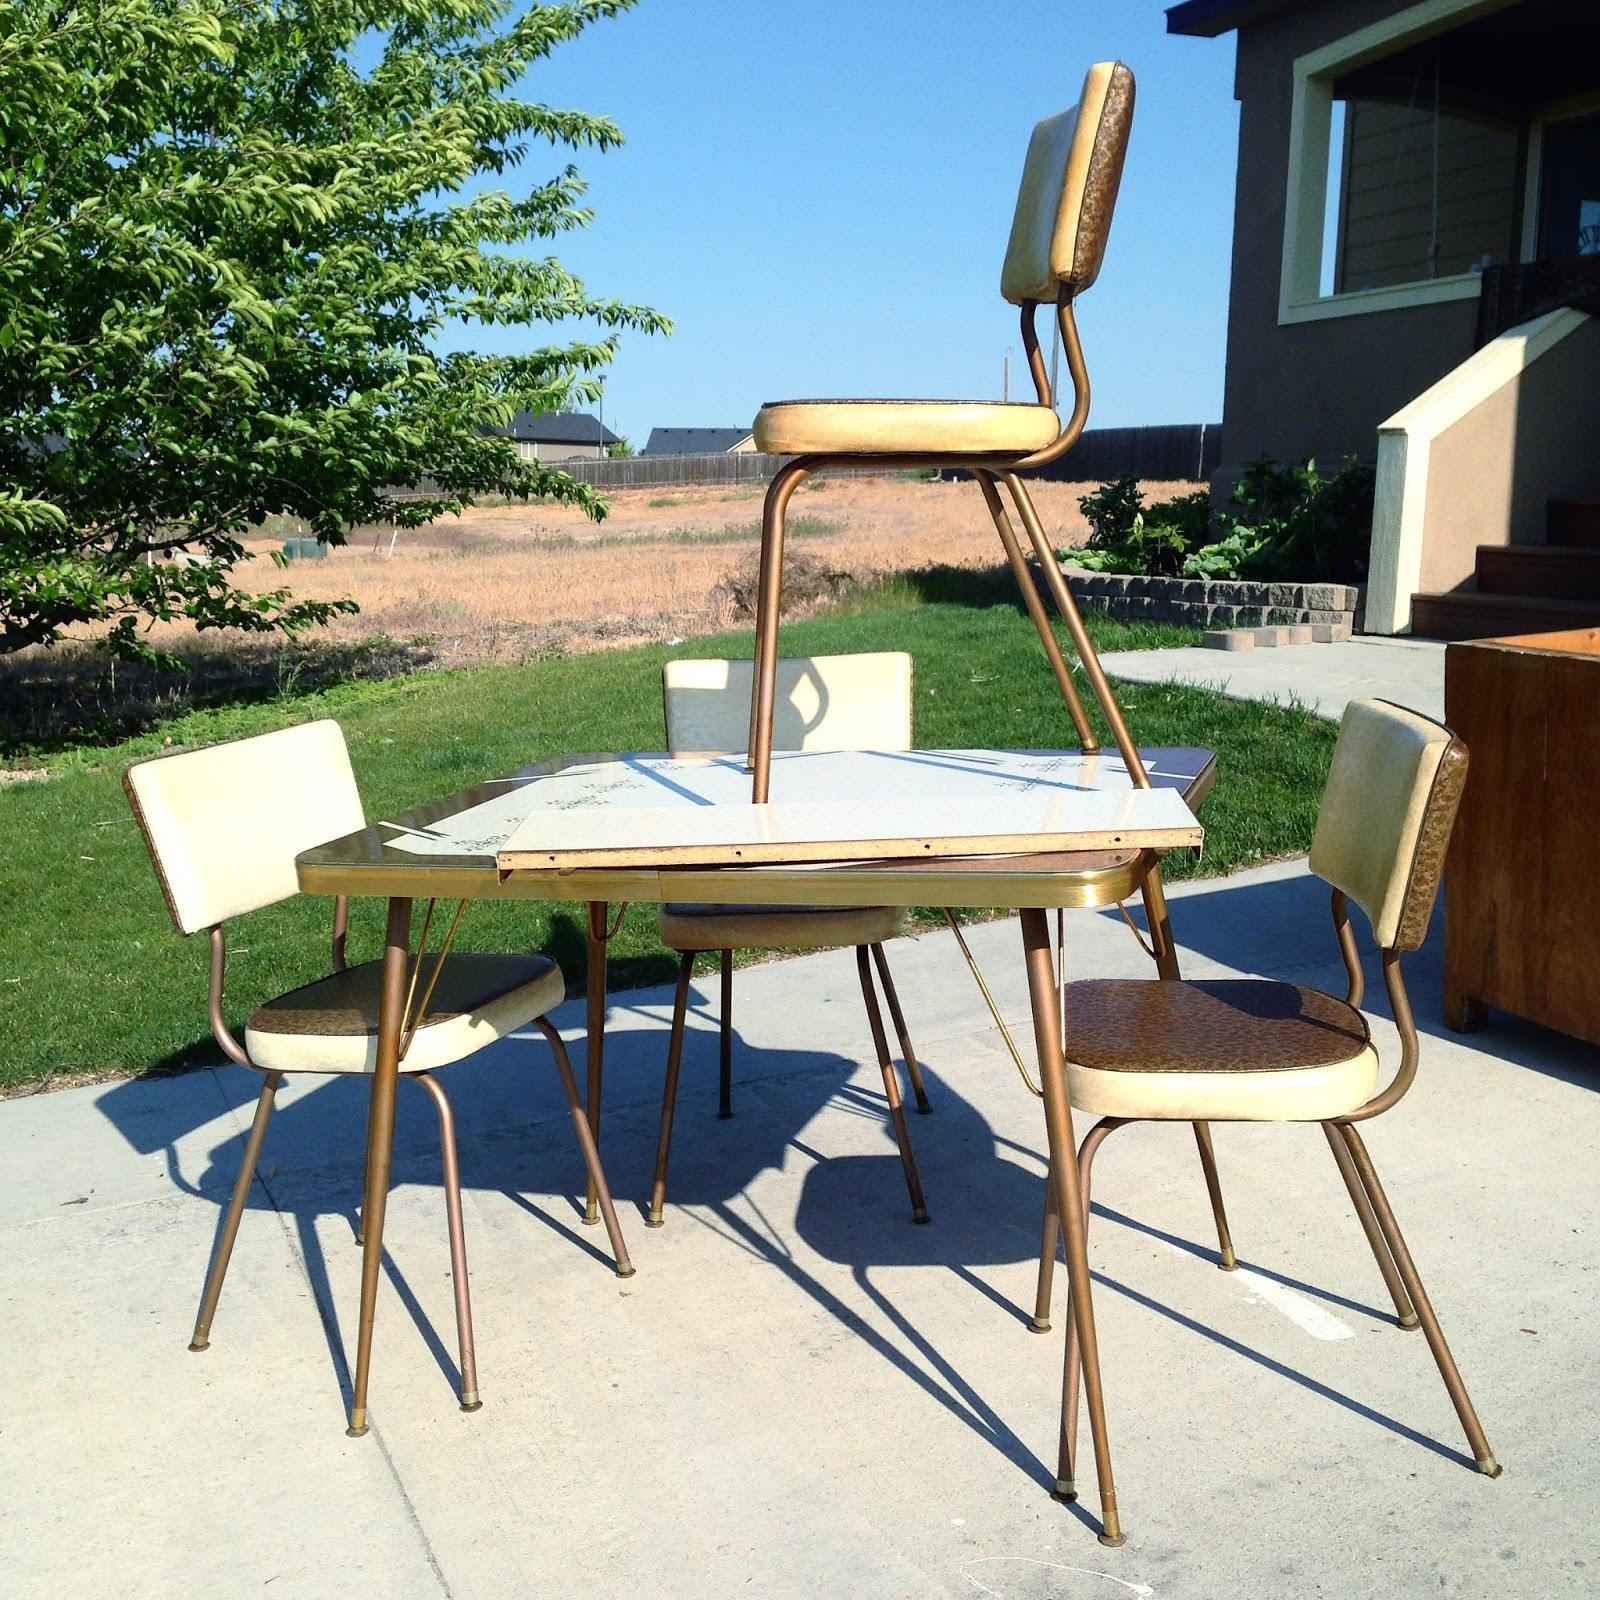 Mod Podge Kitchen Table How To Make Over A Vintage Vinyl Dinette Set Using Spray Paint